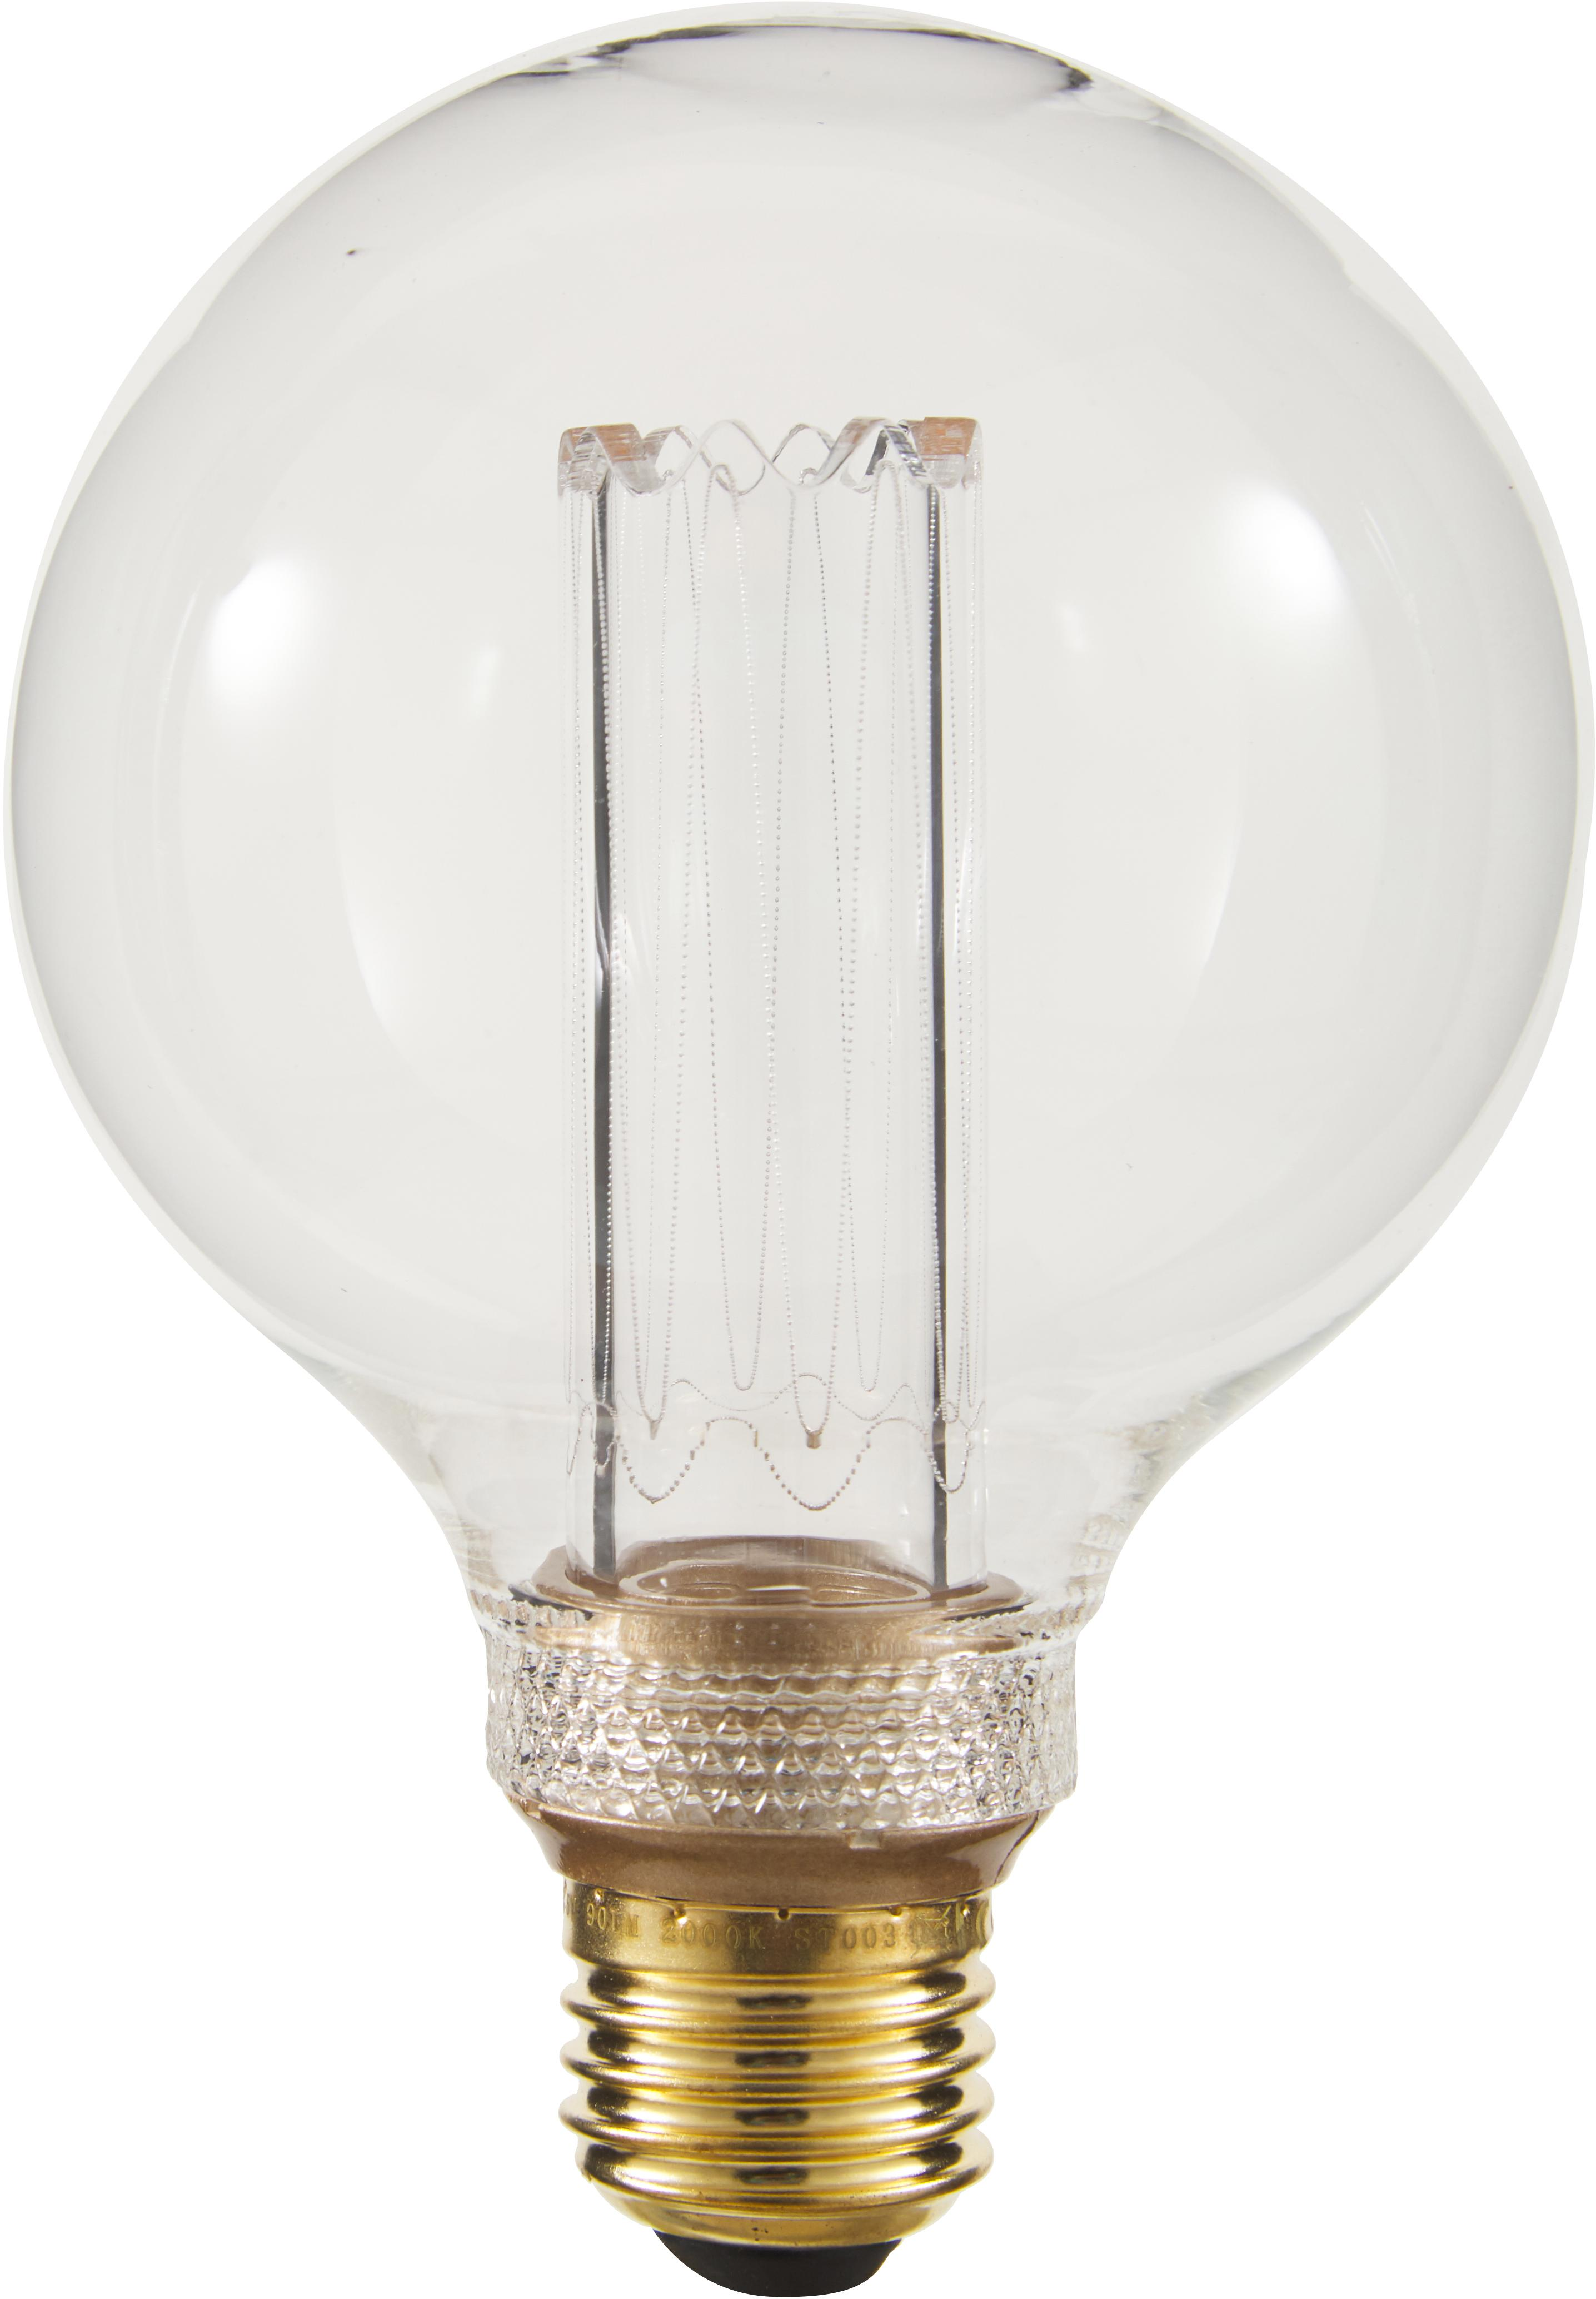 Lampadina a LED dimmable  New Generation (E27/ 2,5Watt), Paralume: Vetro, Base lampadina: ottone, Ambra, Ø 10 x Alt. 15 cm